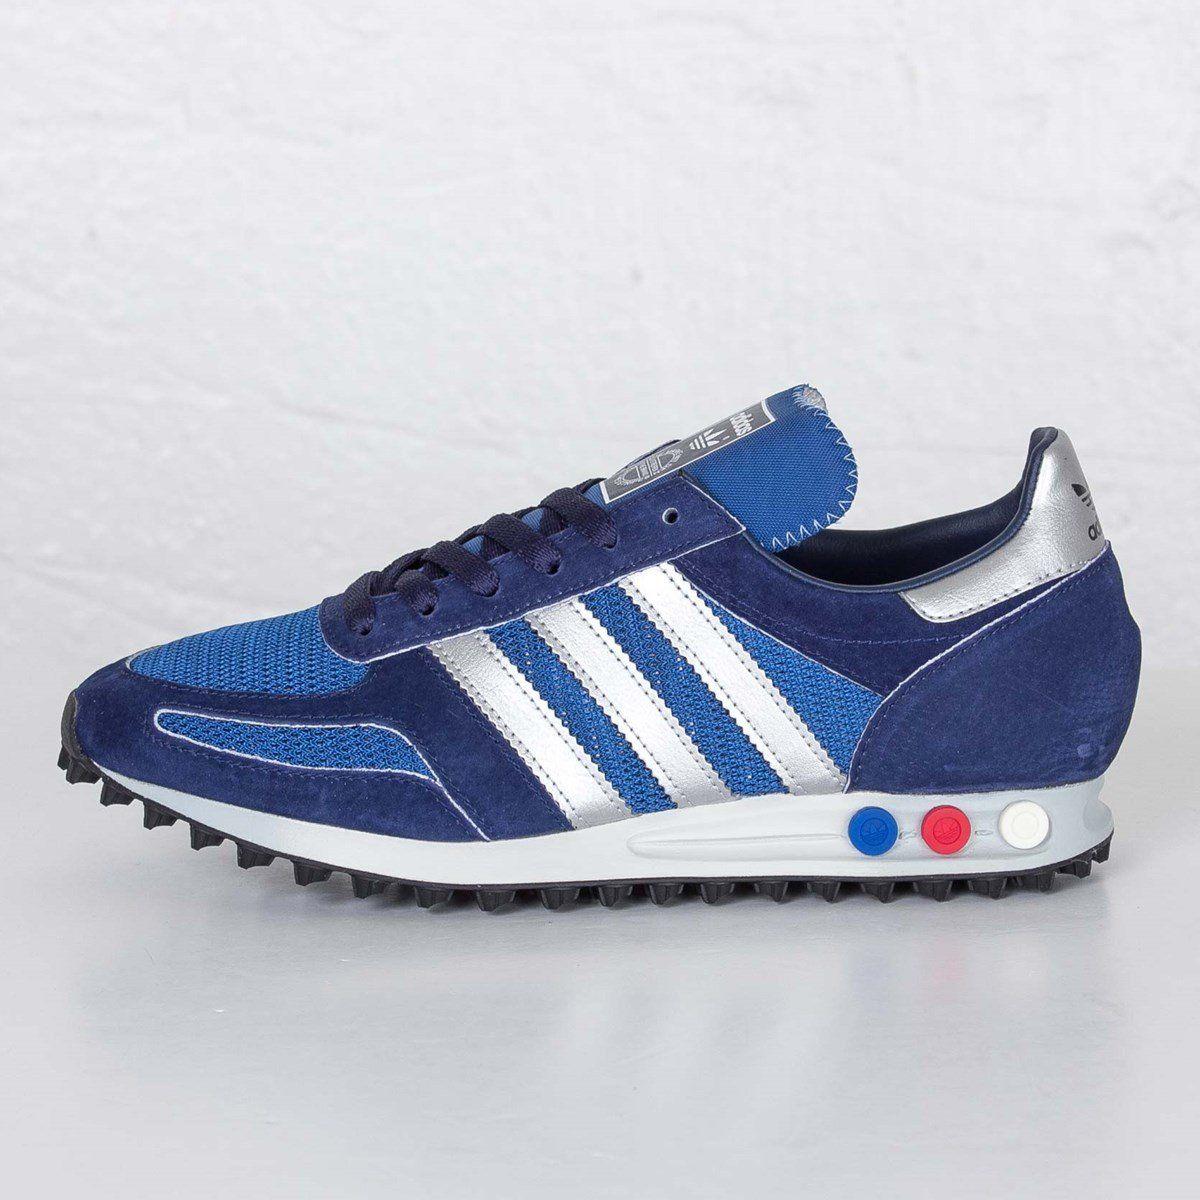 adidas LA Trainer OG - Aq4930 - Sneakersnstuff | sneakers ...